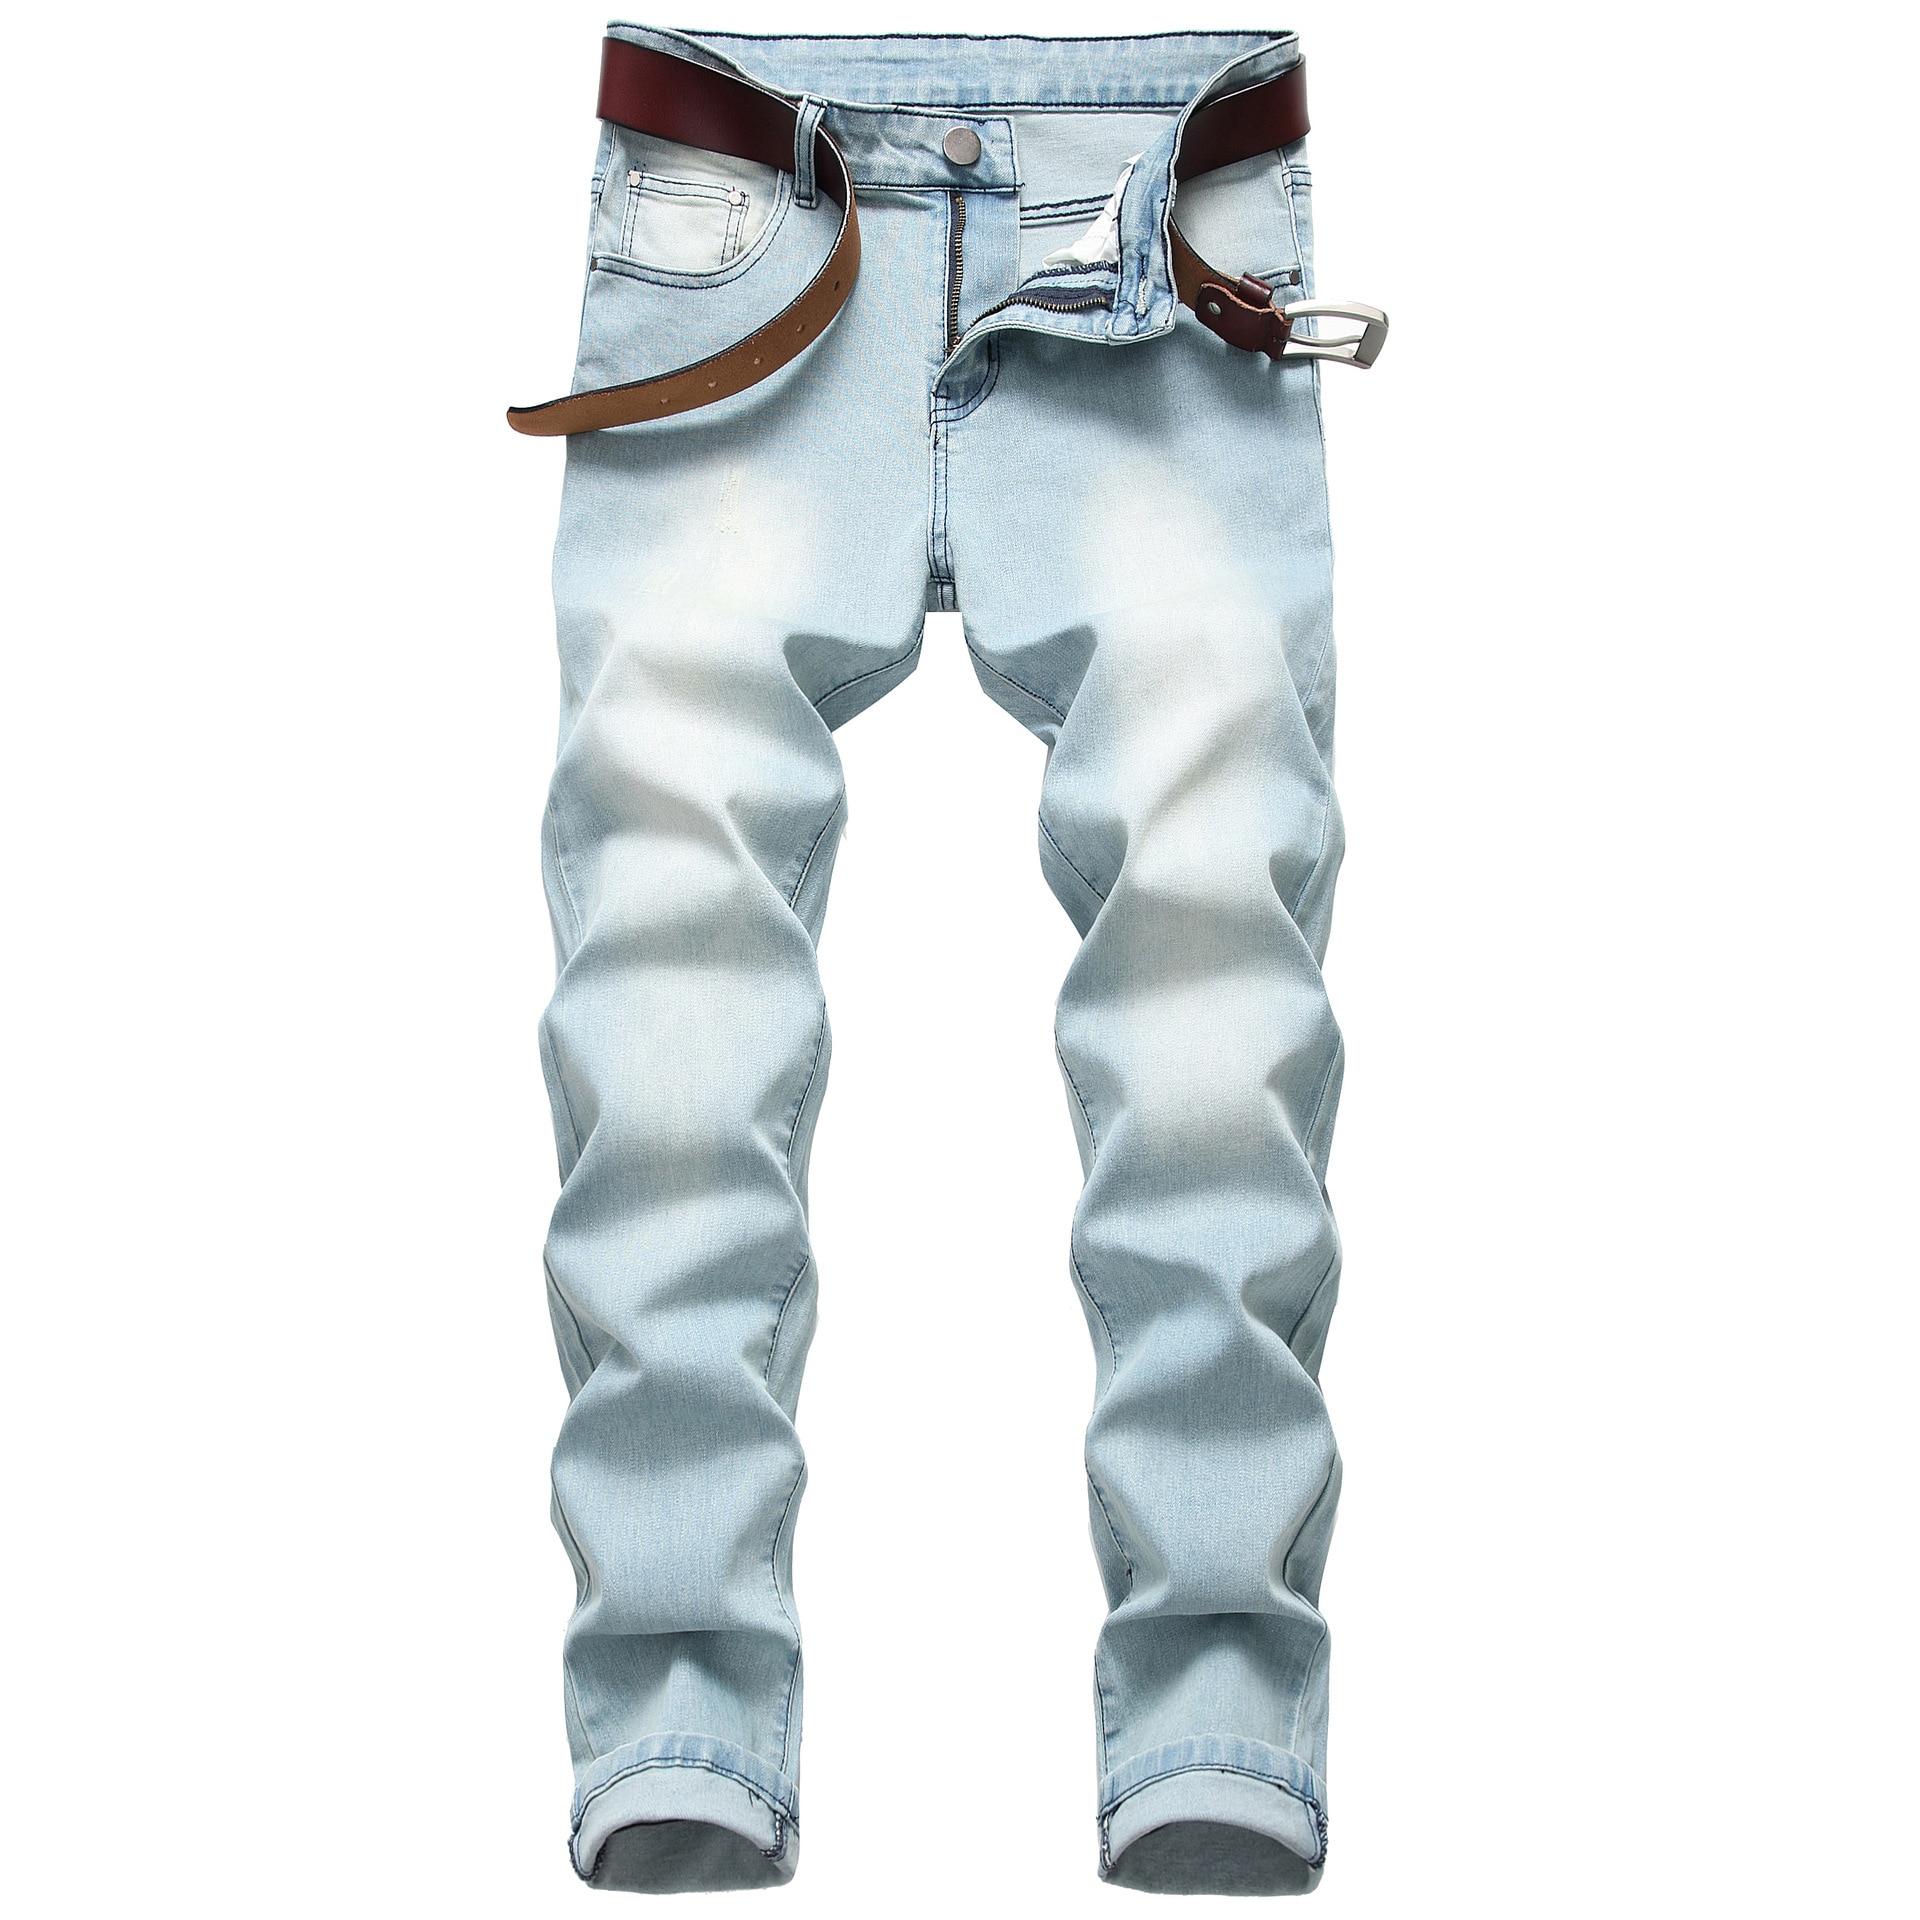 Gersri Men Denim Trousers Slim Retro Jeans Slim Skinny Men Casual Plus Size High Quality Brand Male Jeans Student